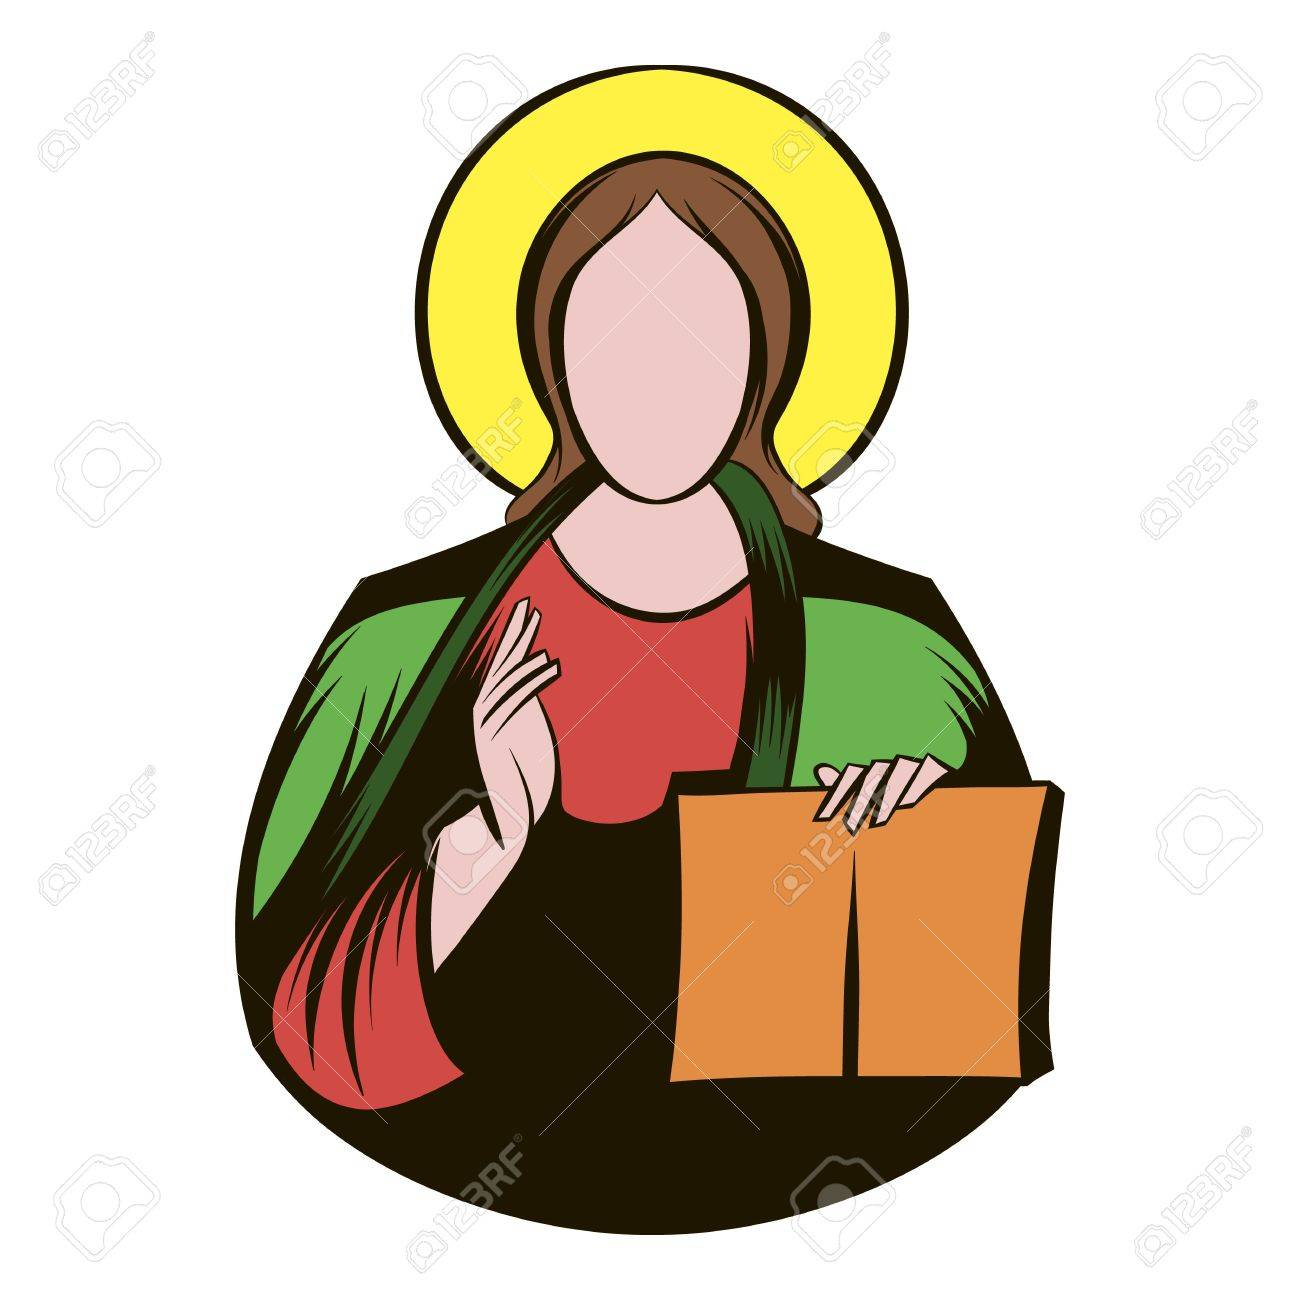 1300x1300 Jesus Christ Icon Cartoon Royalty Free Cliparts, Vectors,